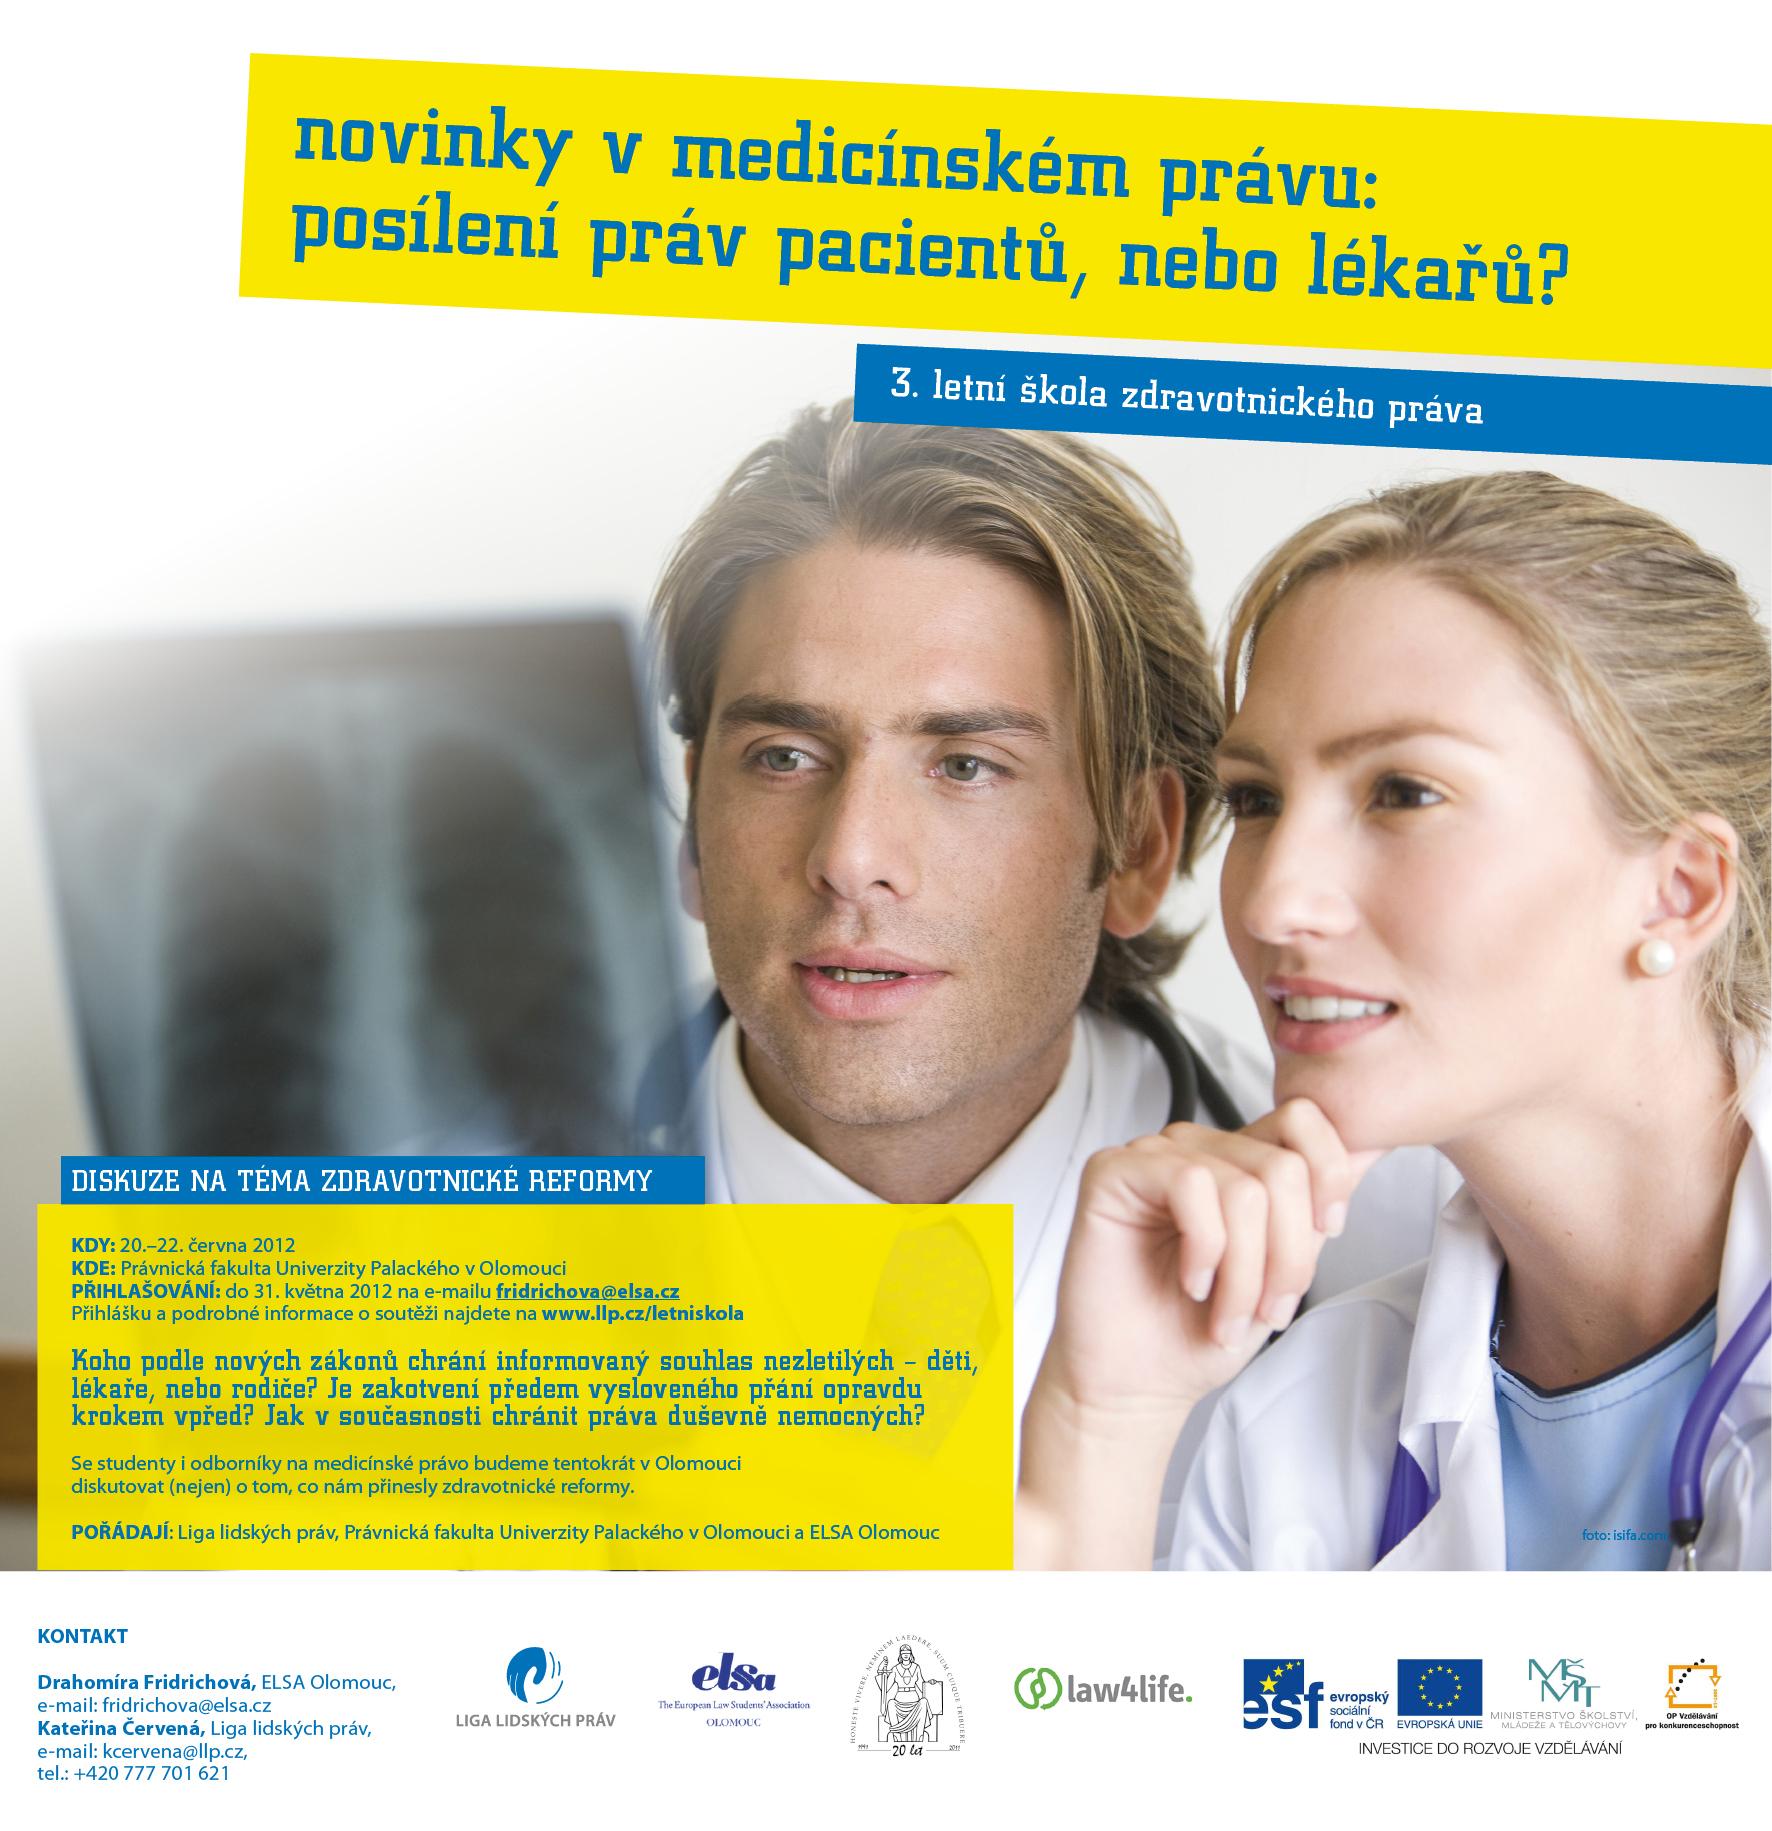 http://llp.cz/wp-content/uploads/300x310_diskuze_medical-3.jpg